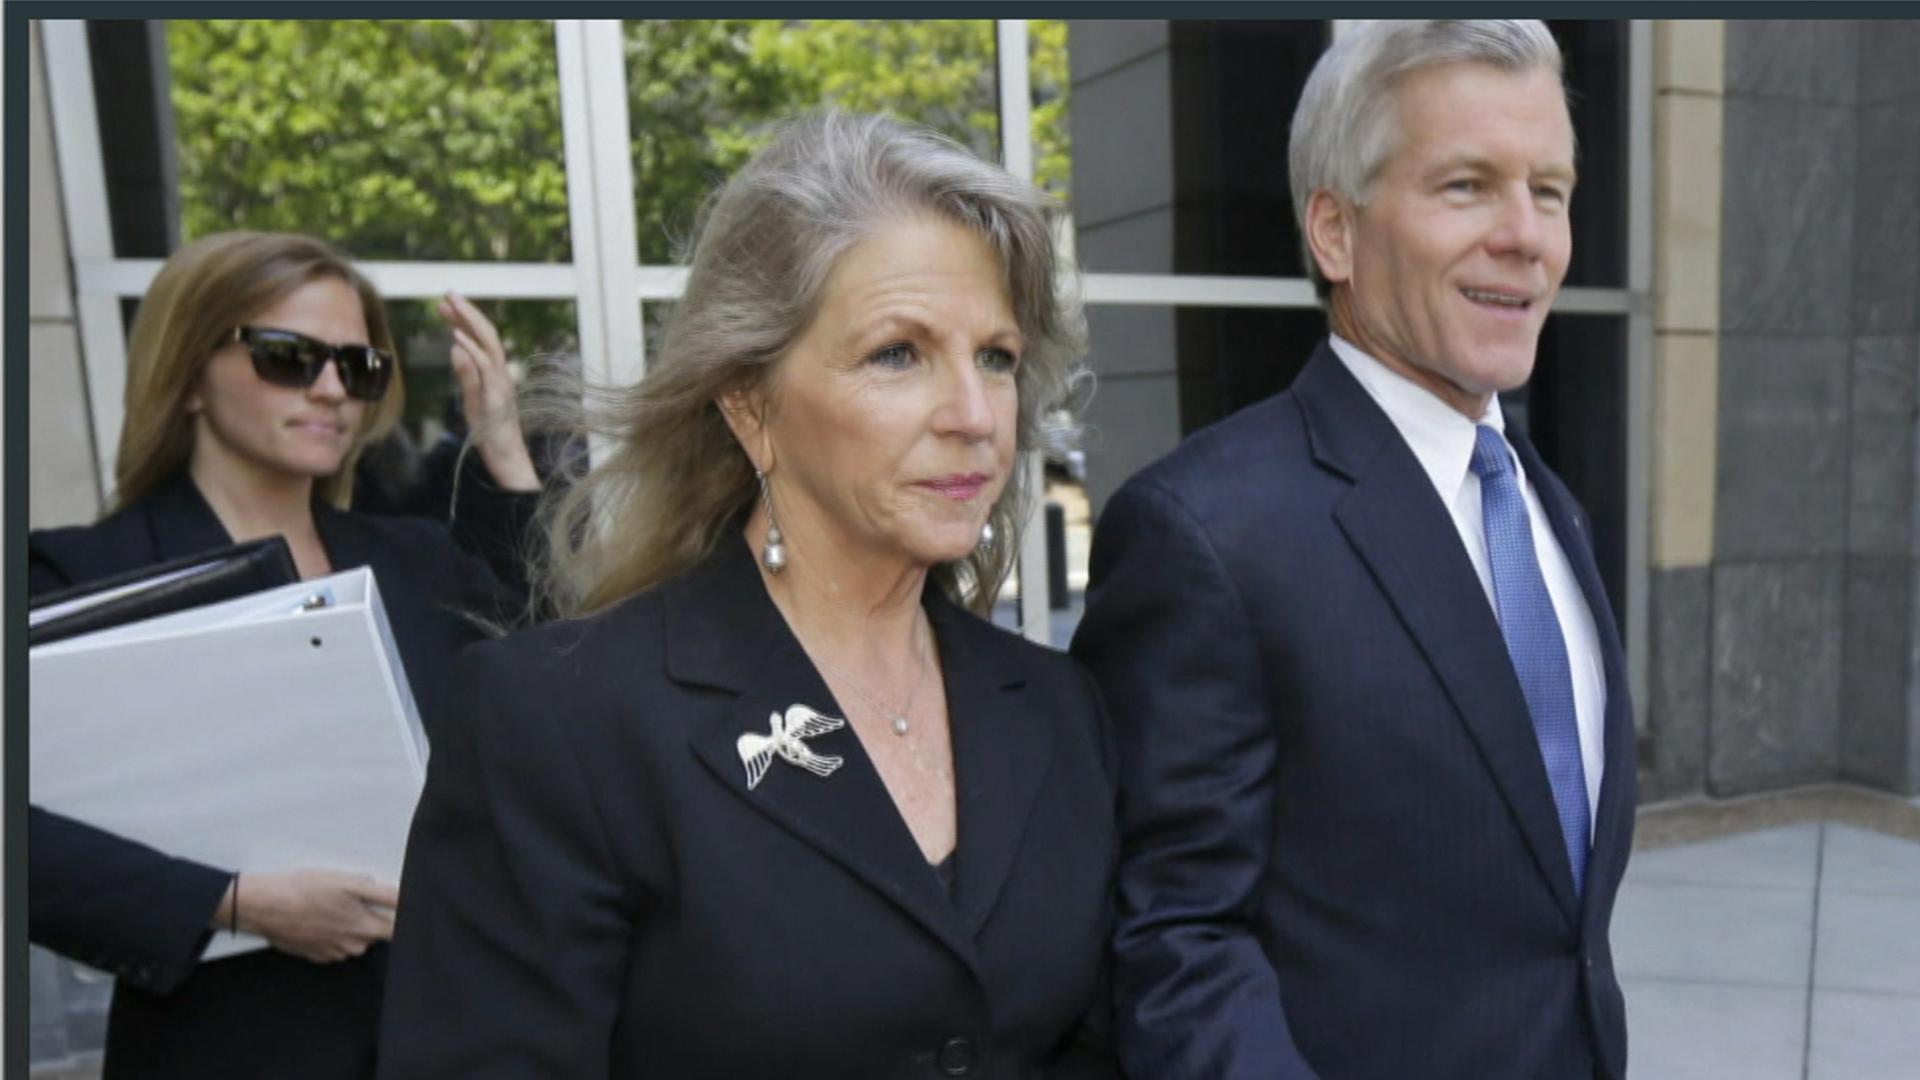 Jury weighs key disparities in McDonnell case